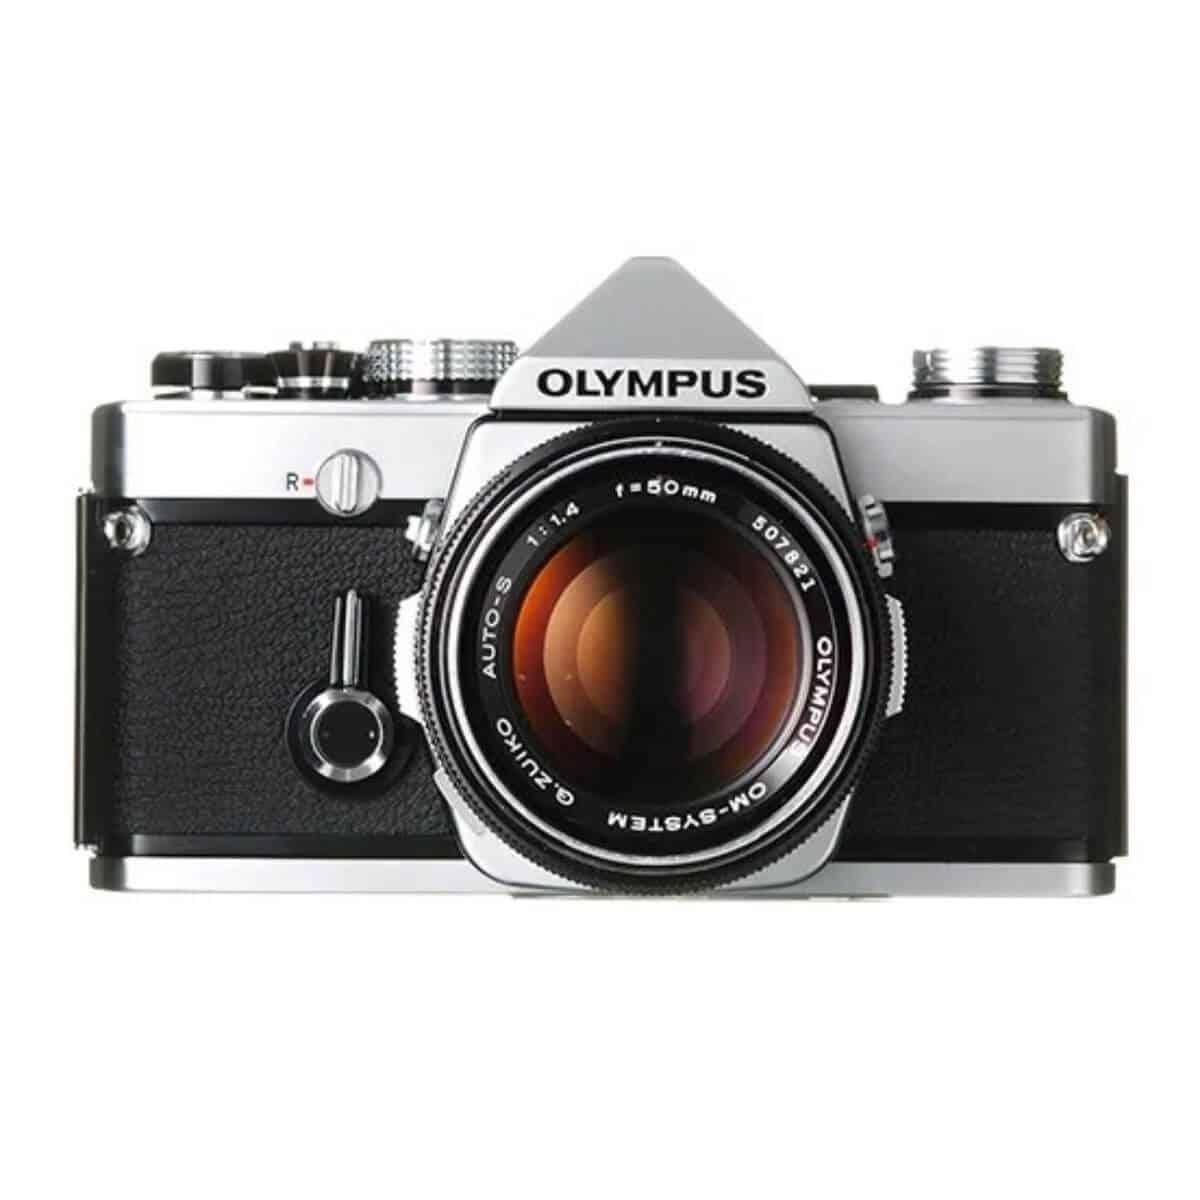 Olympus OM-1 35mm film camera.